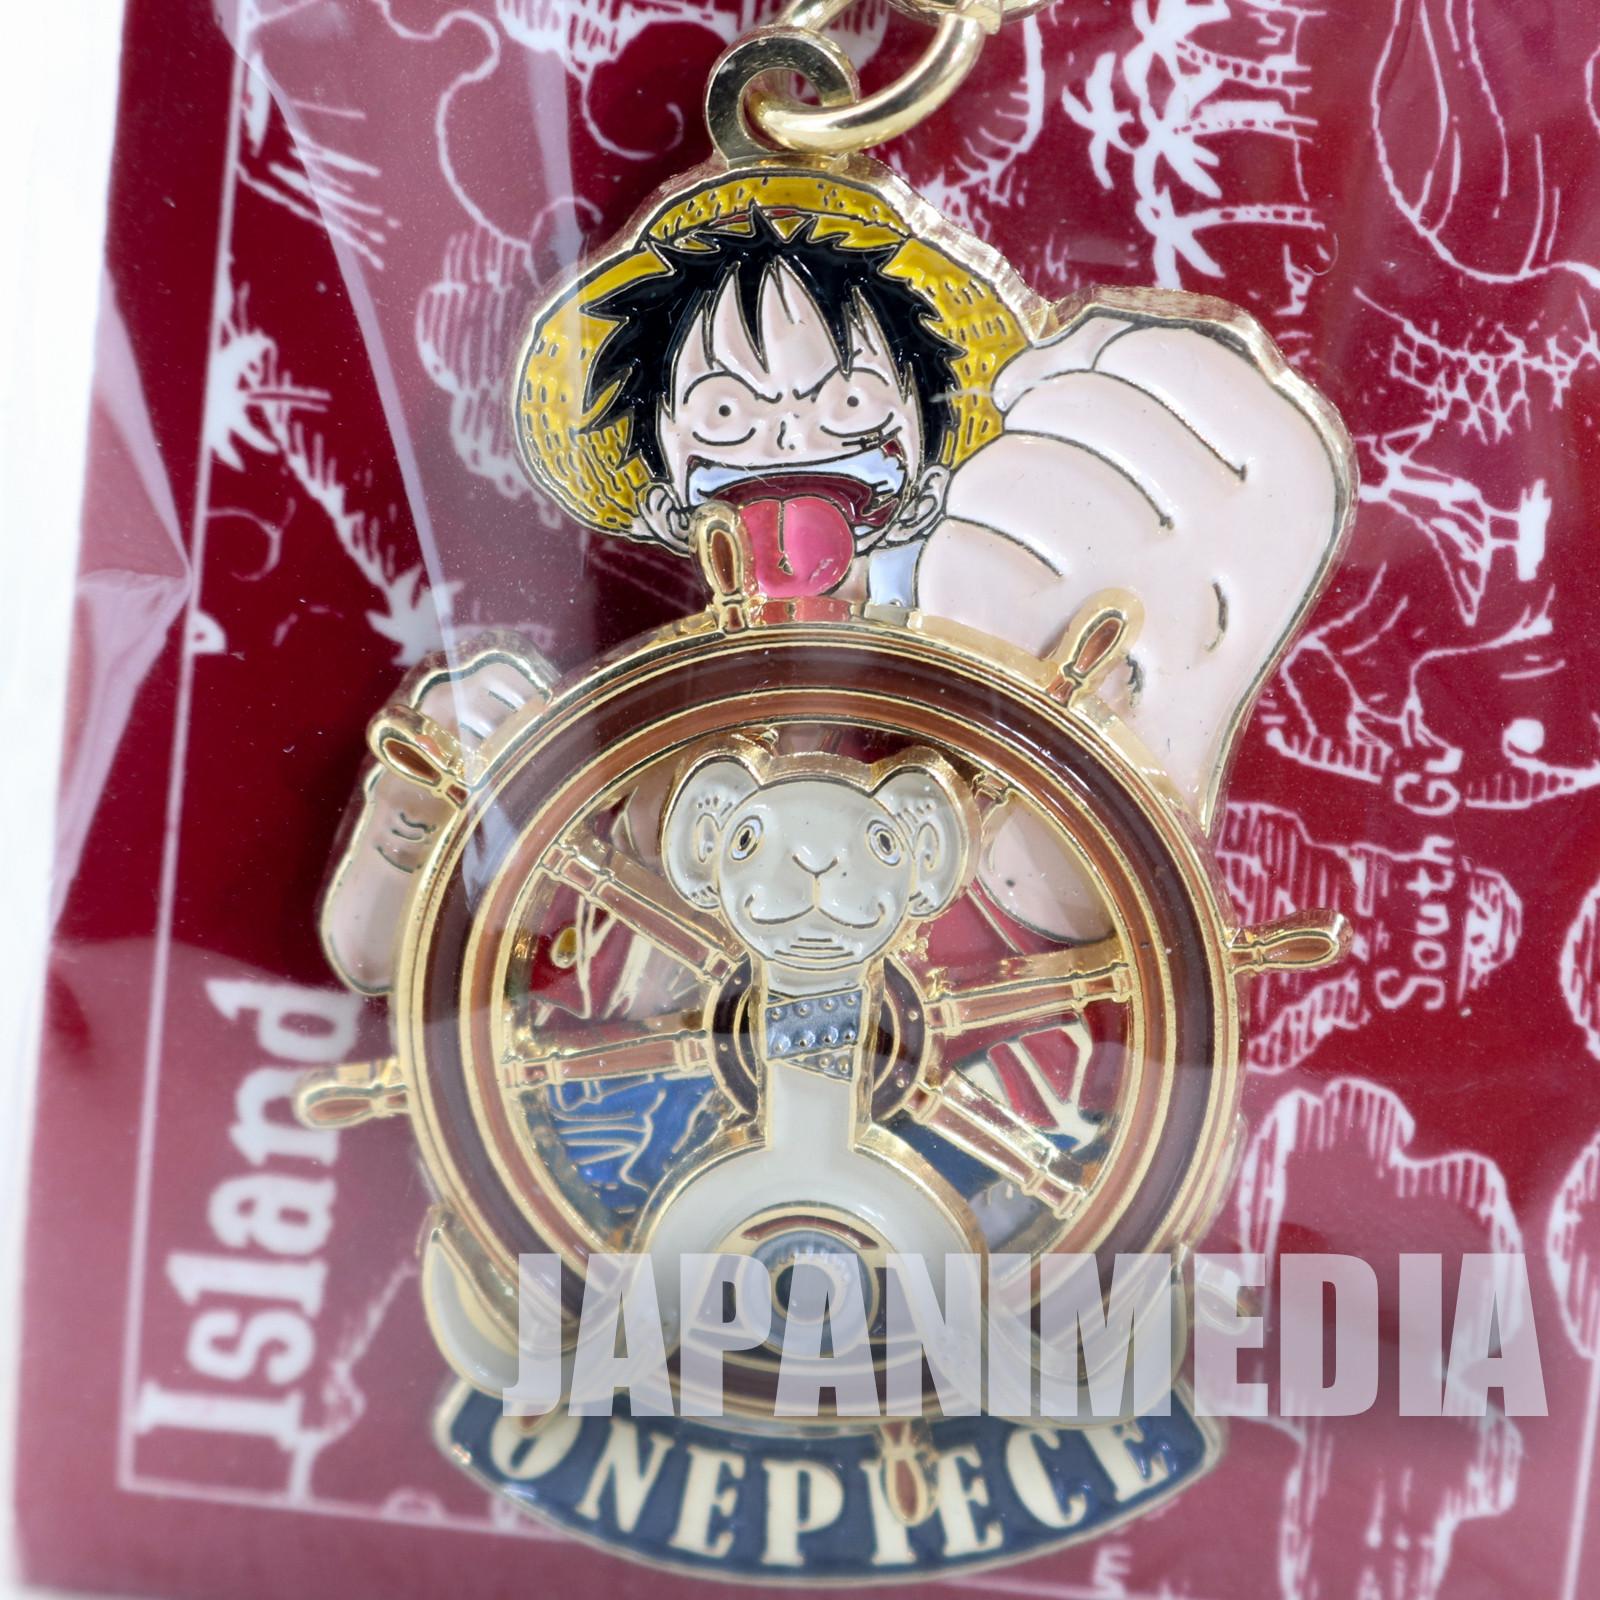 One Piece Luffy Metal Charm Keychain Shonen Jump JAPAN ANIME 2